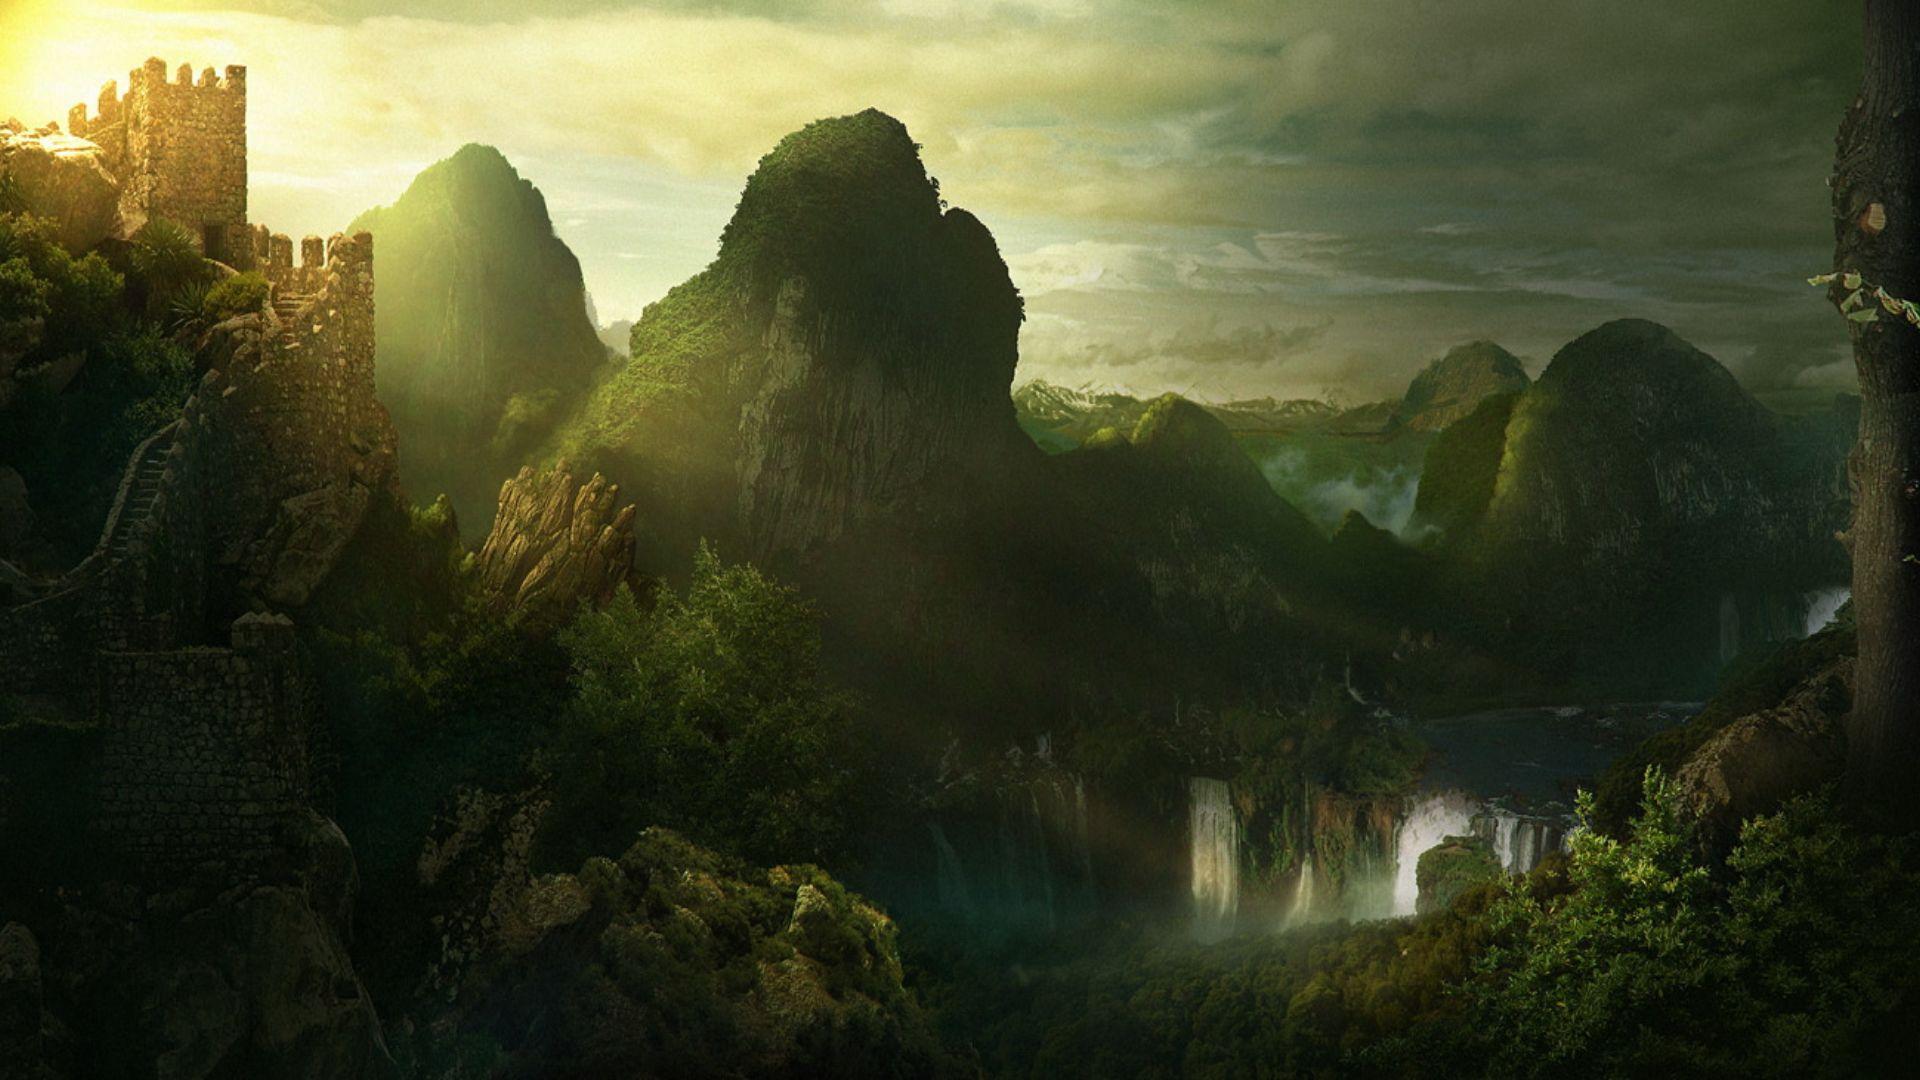 fantasy-landscape-Fantasy-Landscape-Sensual-wallpaper-wpc5804722